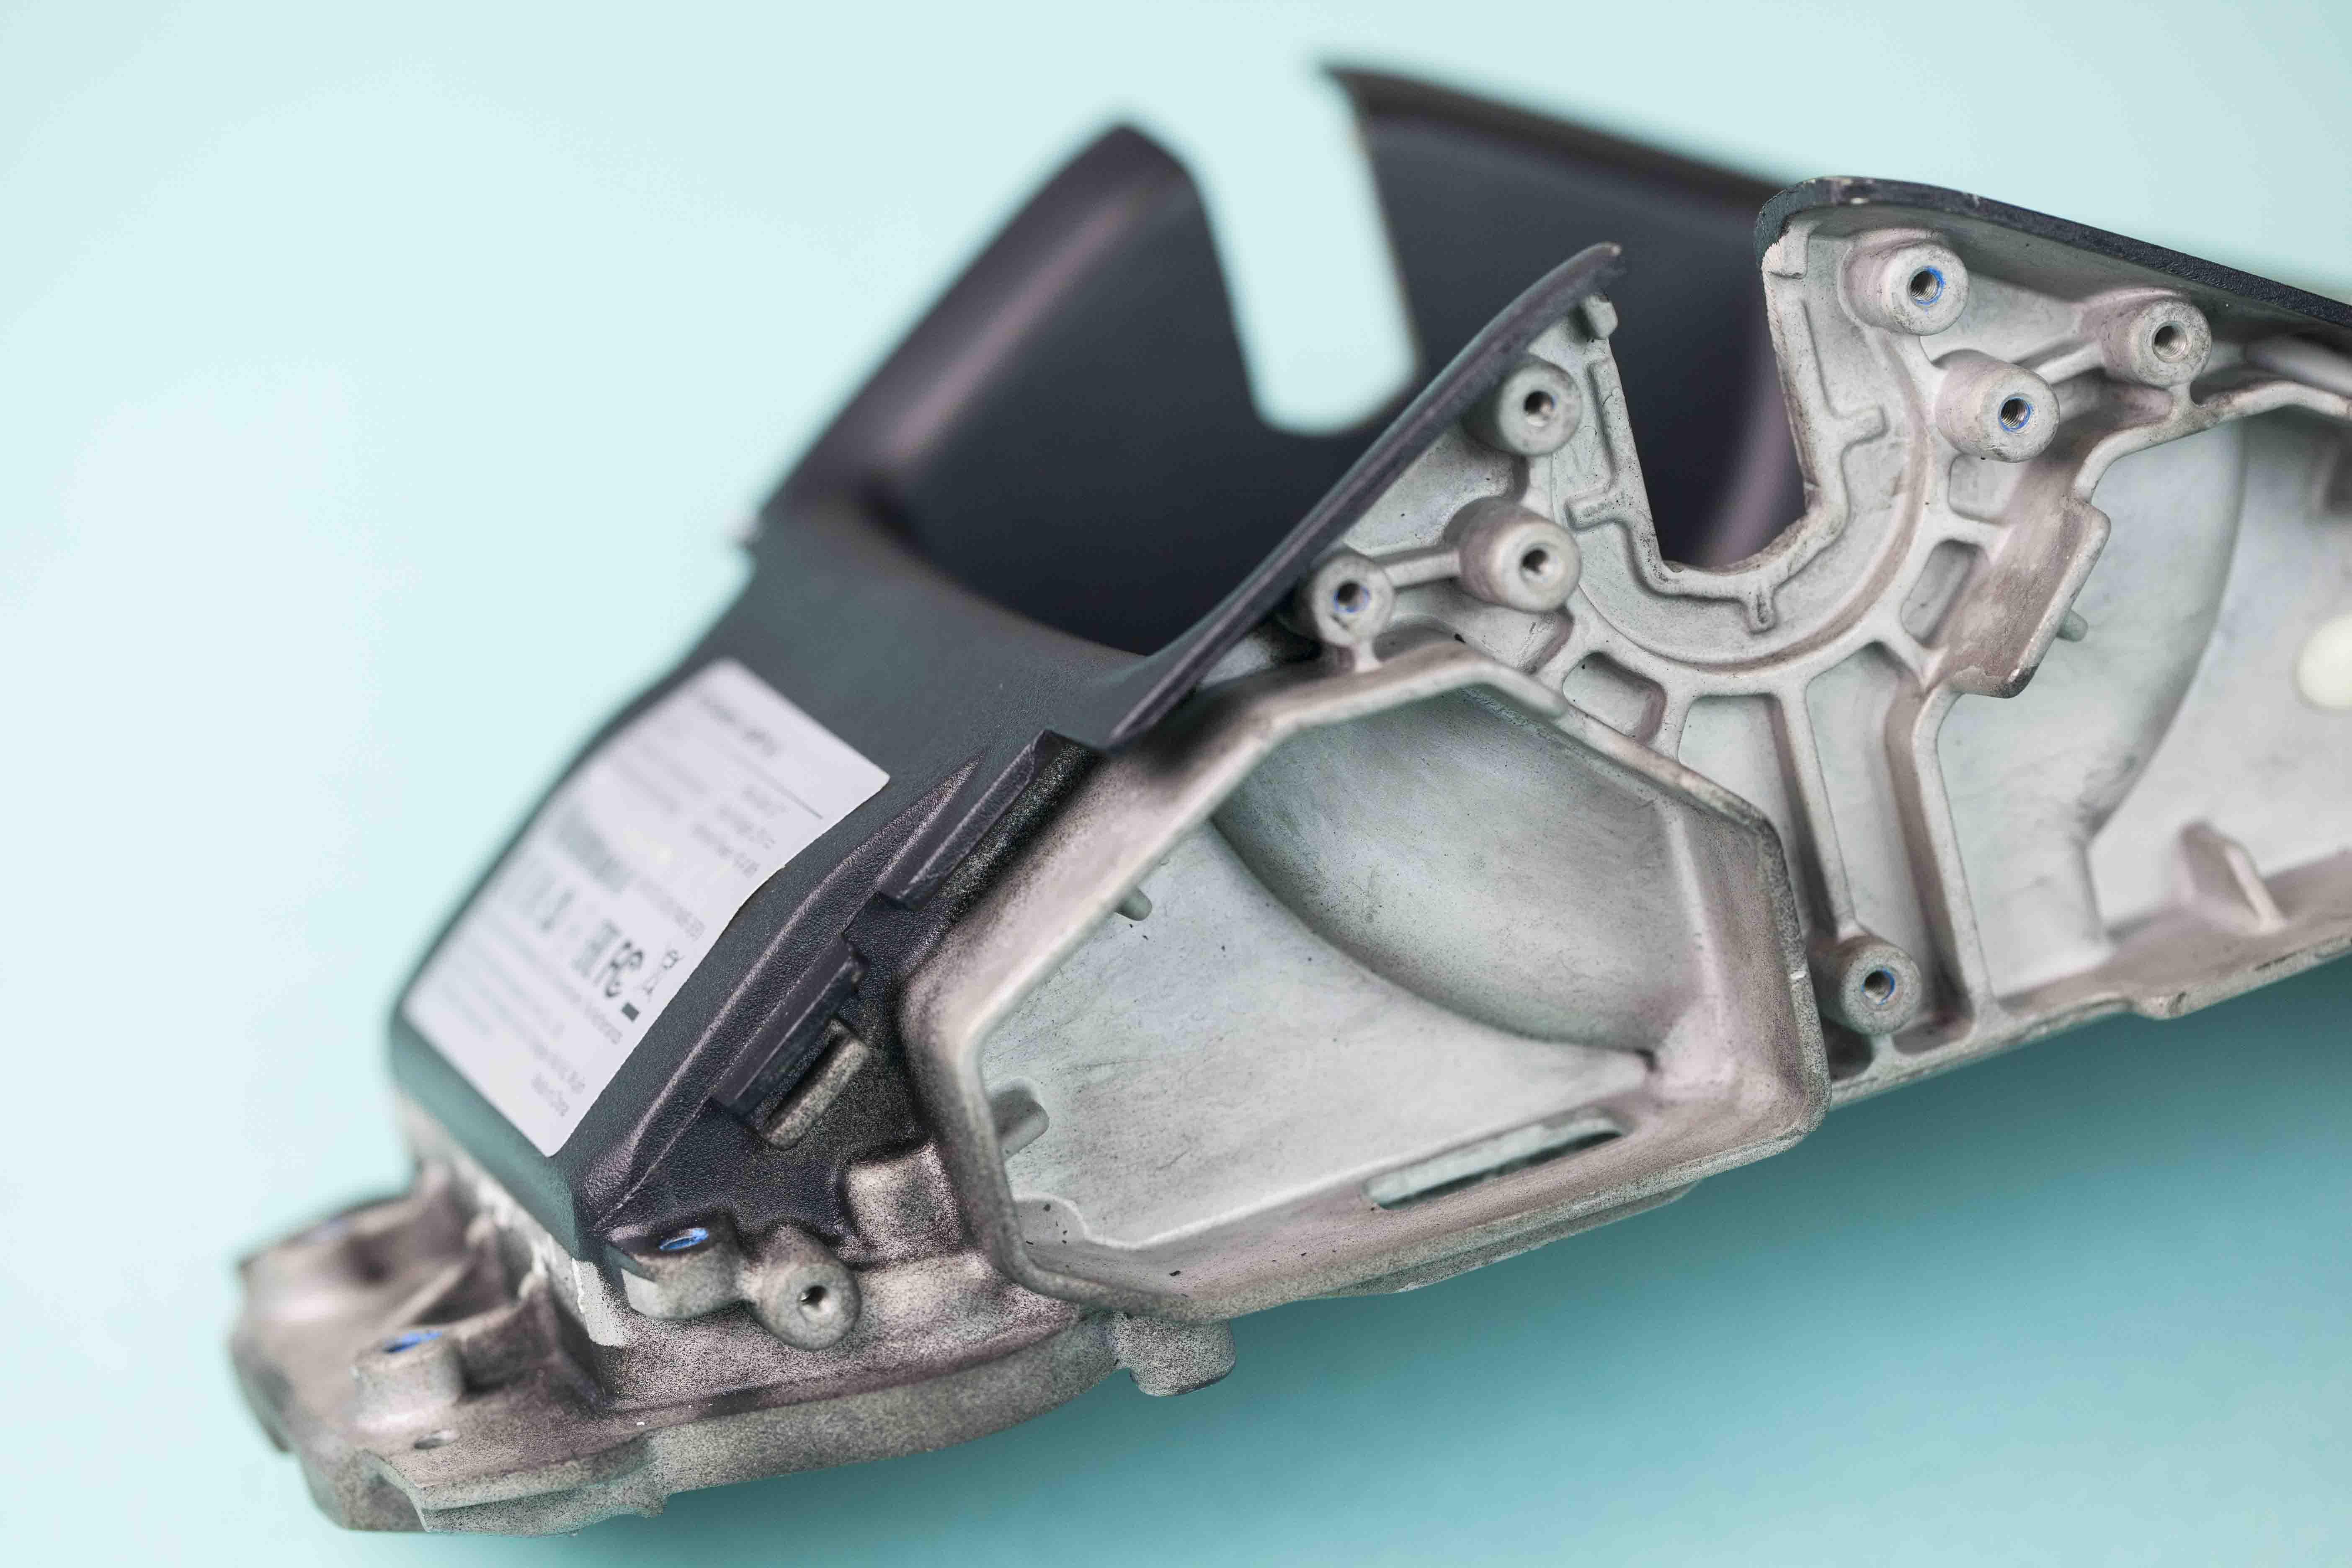 Segway Drift W1 e-Skates Teardown